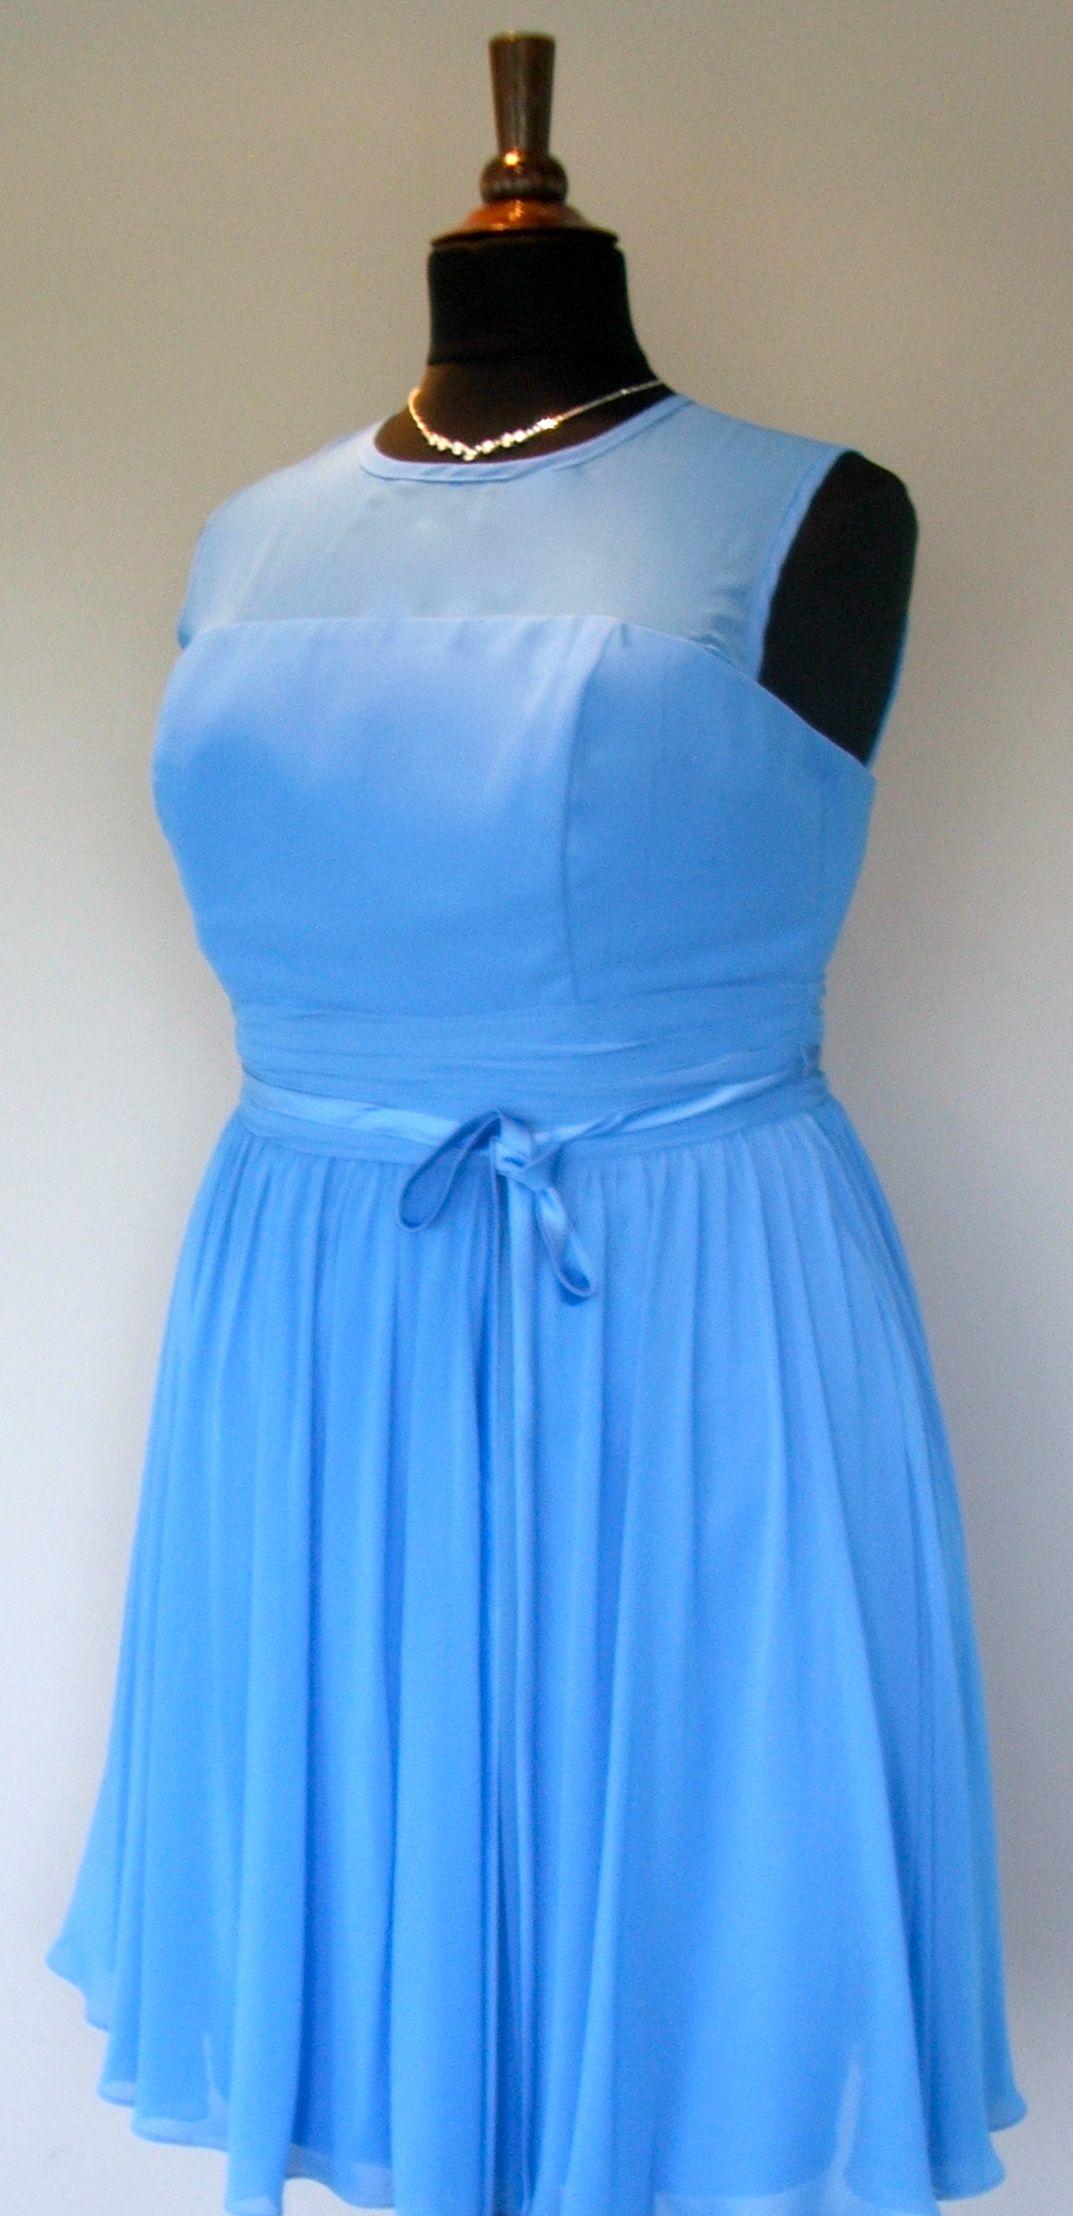 Illusion top plussize bridesmaid dress at koda bridal bridesmaid